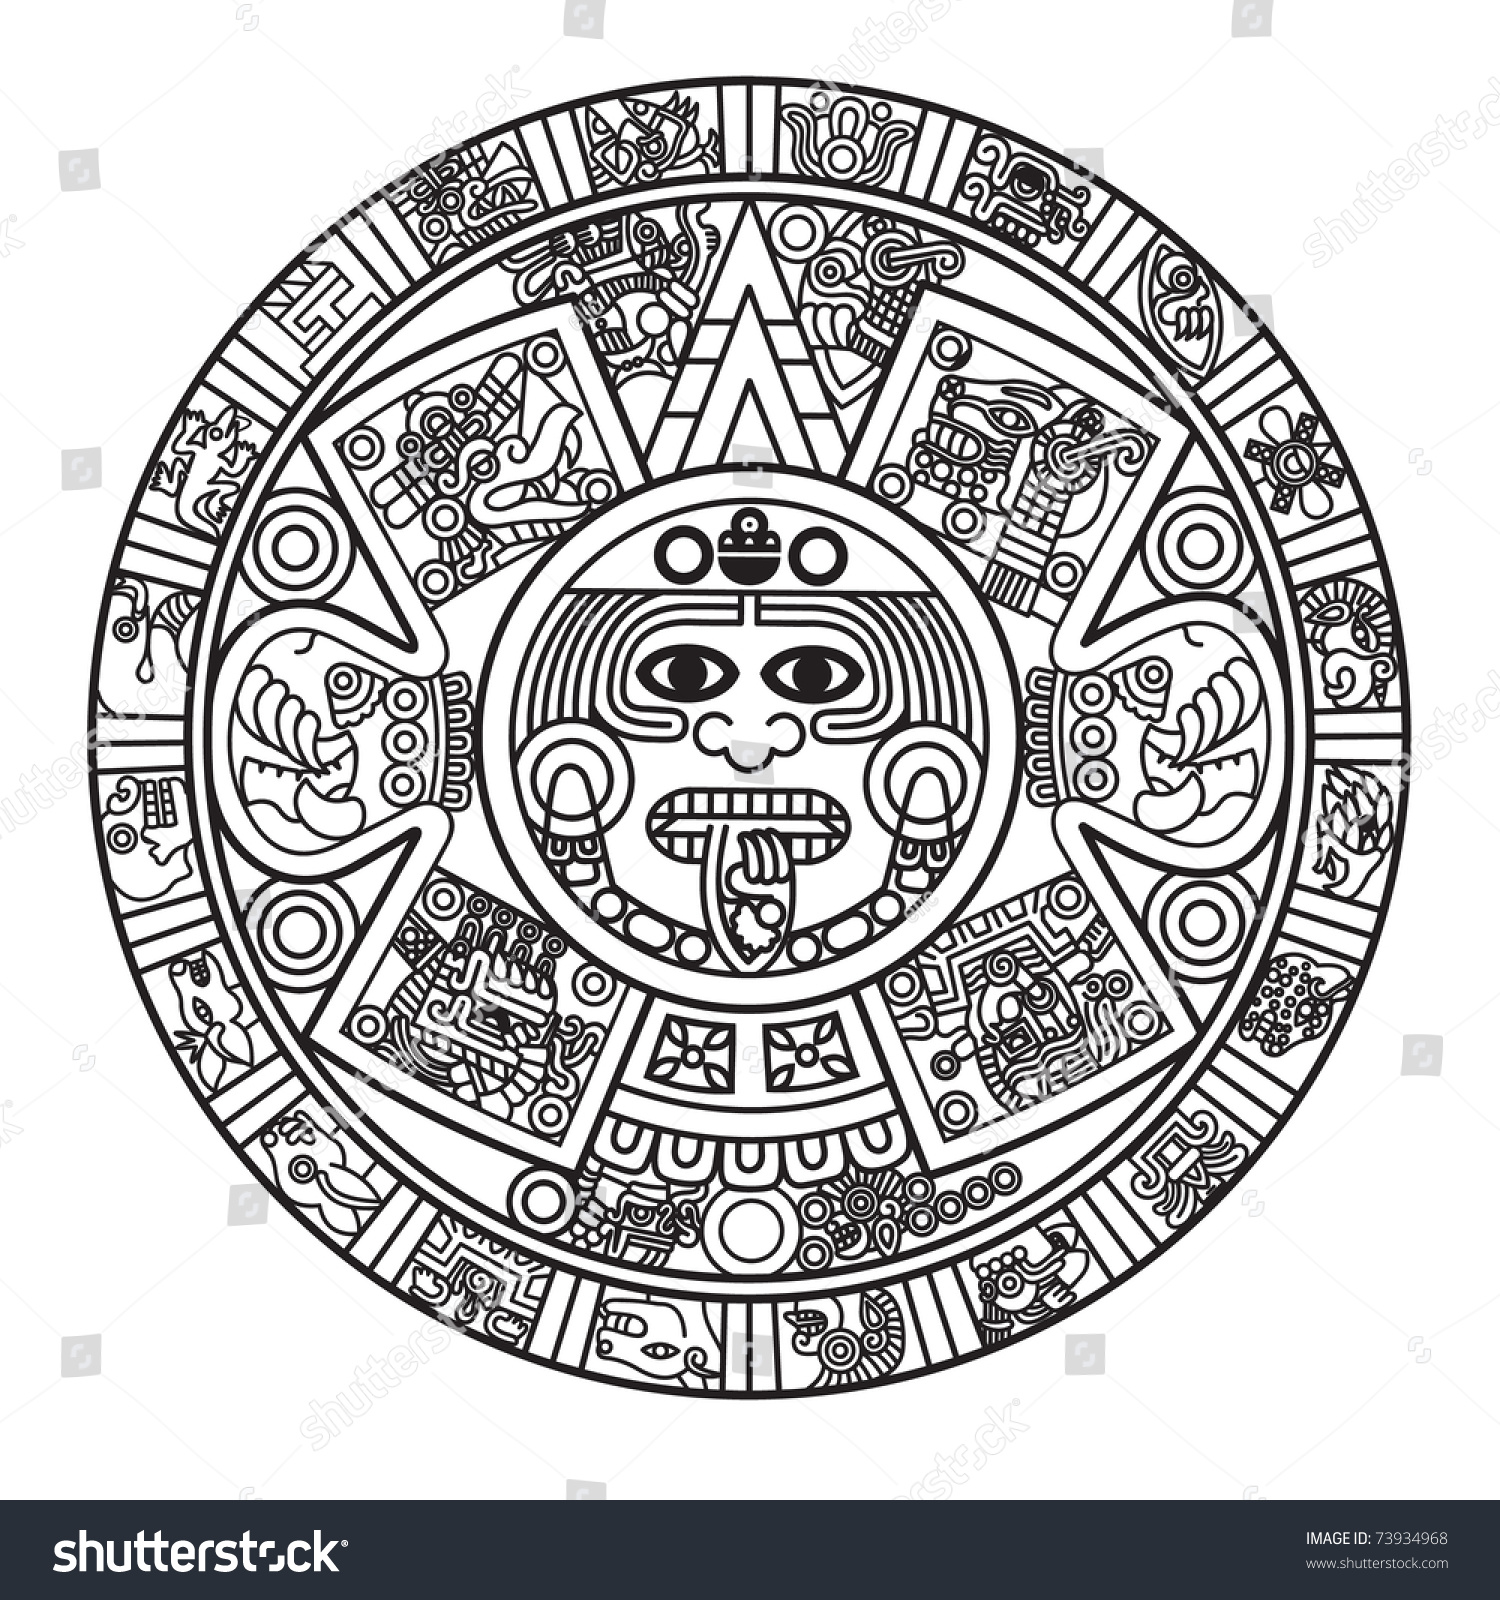 stylized aztec calendar raster version stock illustration 73934968 shutterstock. Black Bedroom Furniture Sets. Home Design Ideas